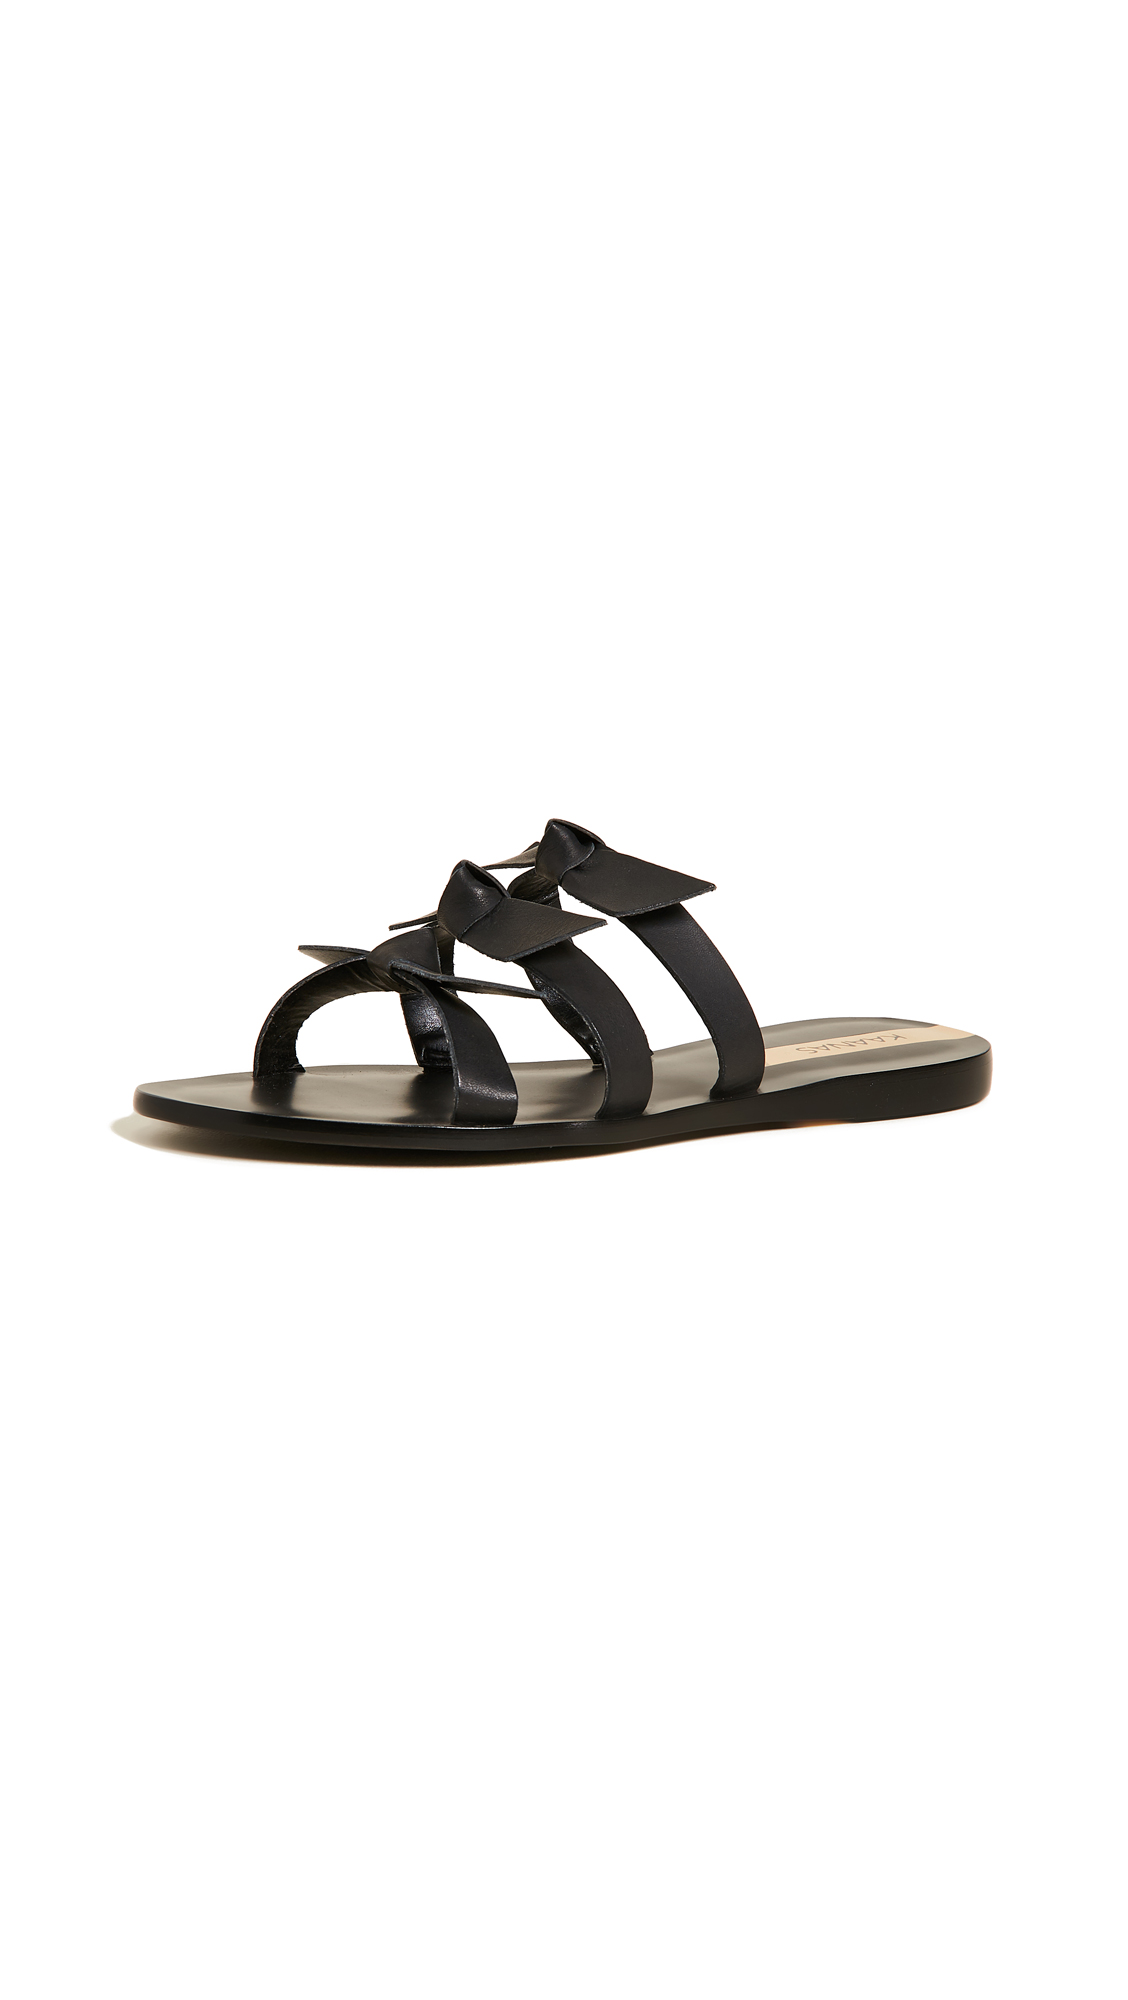 KAANAS Recife Bow Sandals - Black